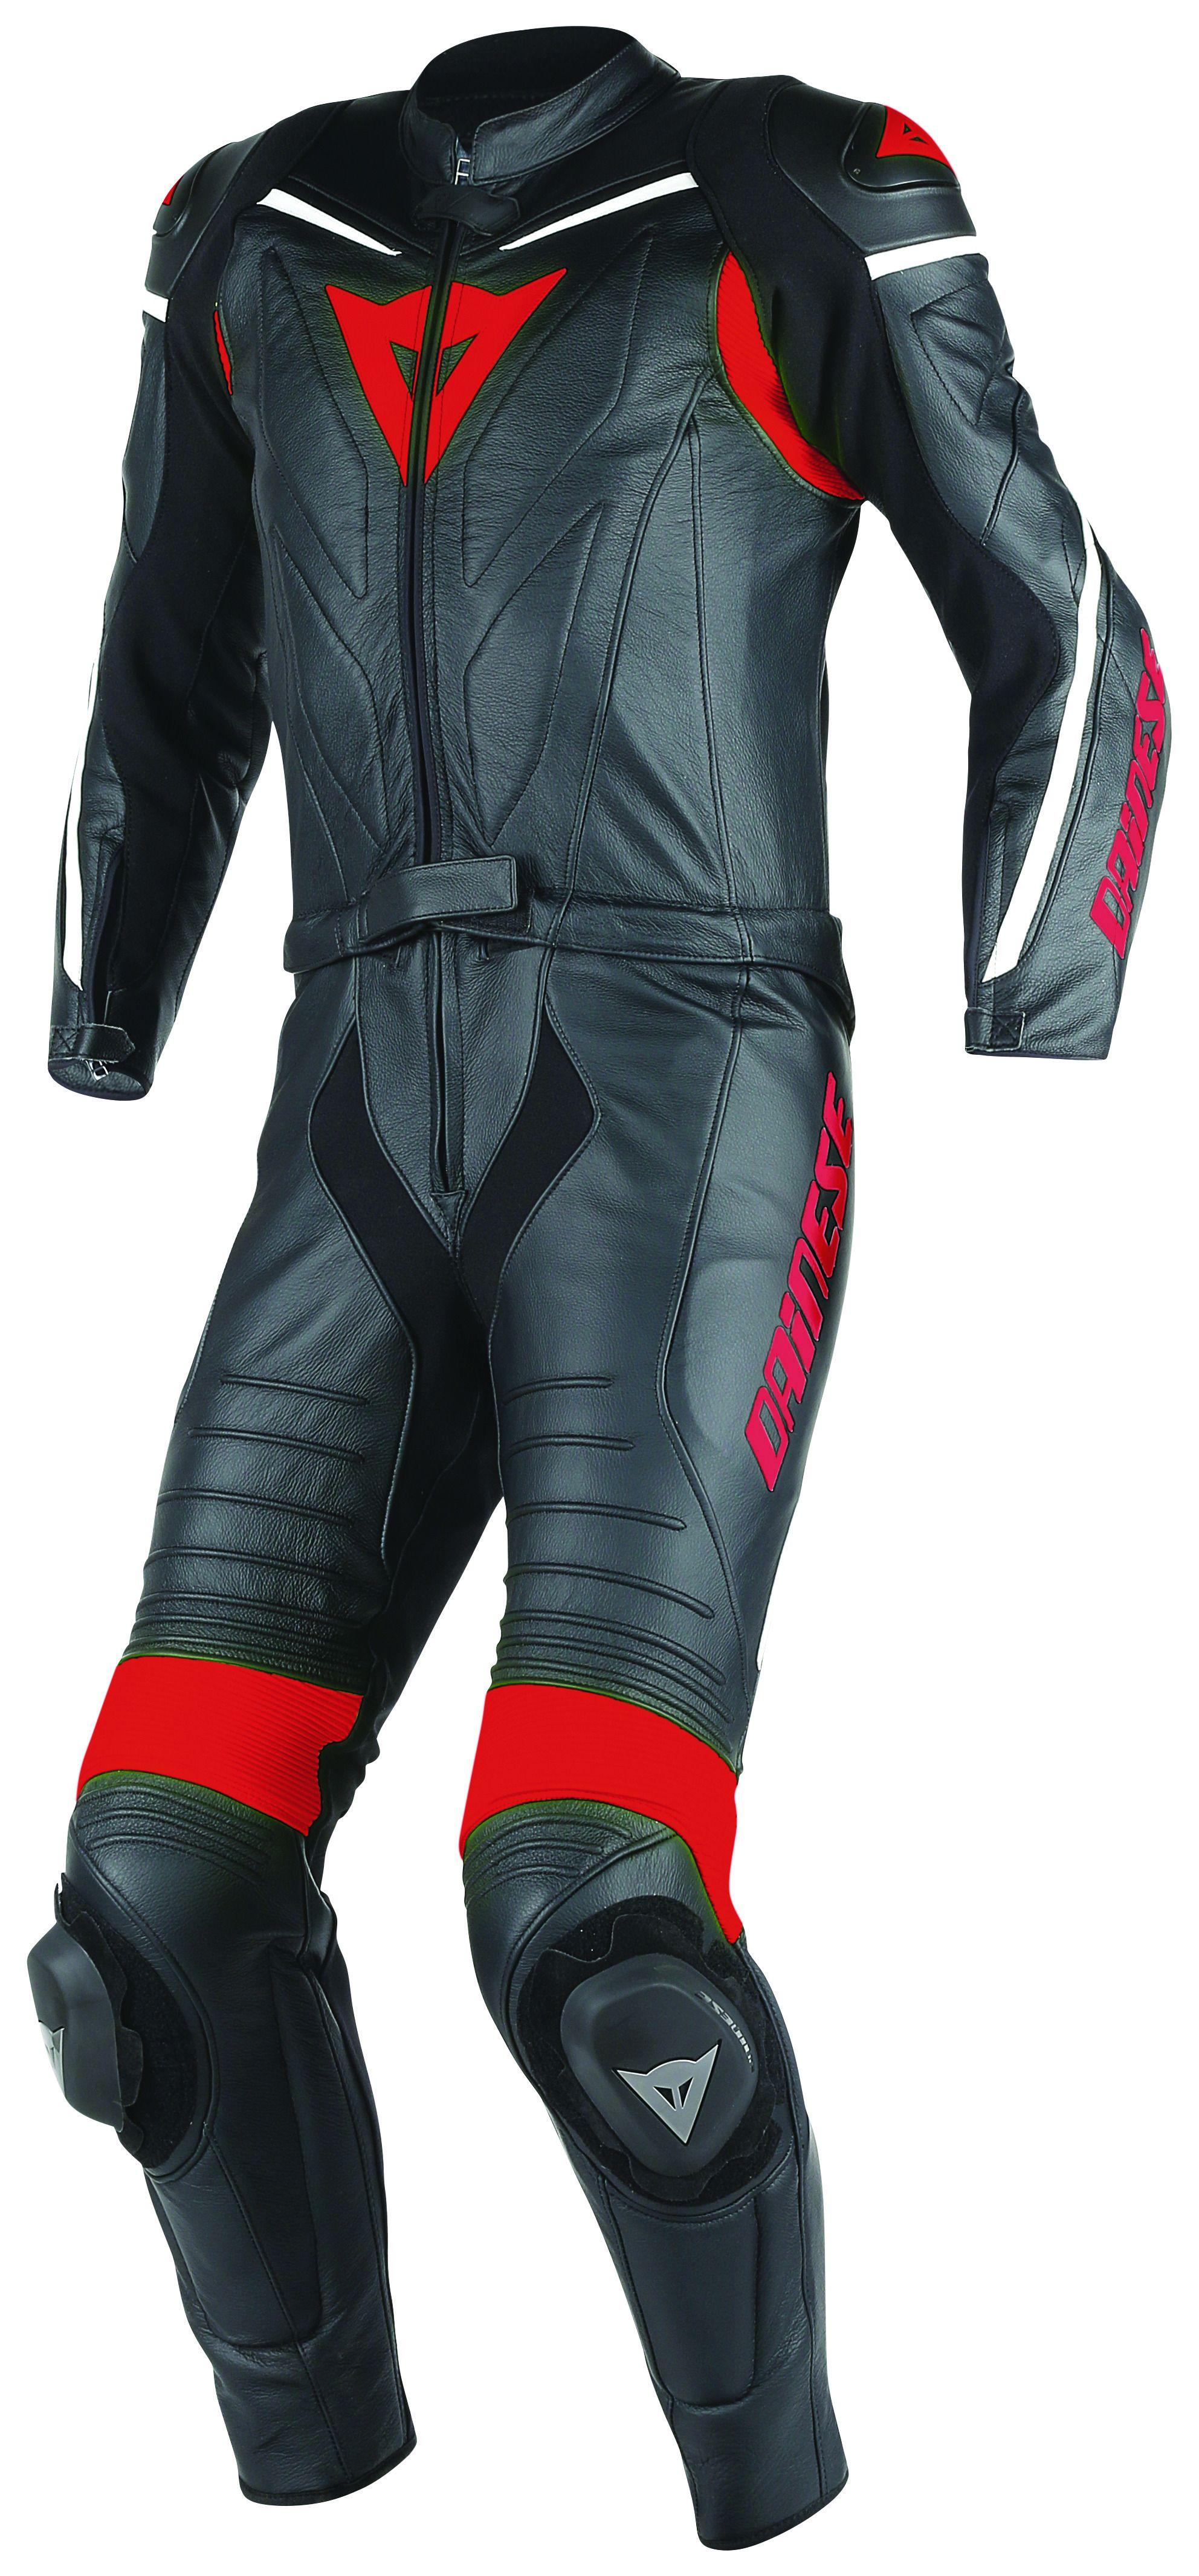 Dainese Laguna Seca D1 Two Piece Race Suit